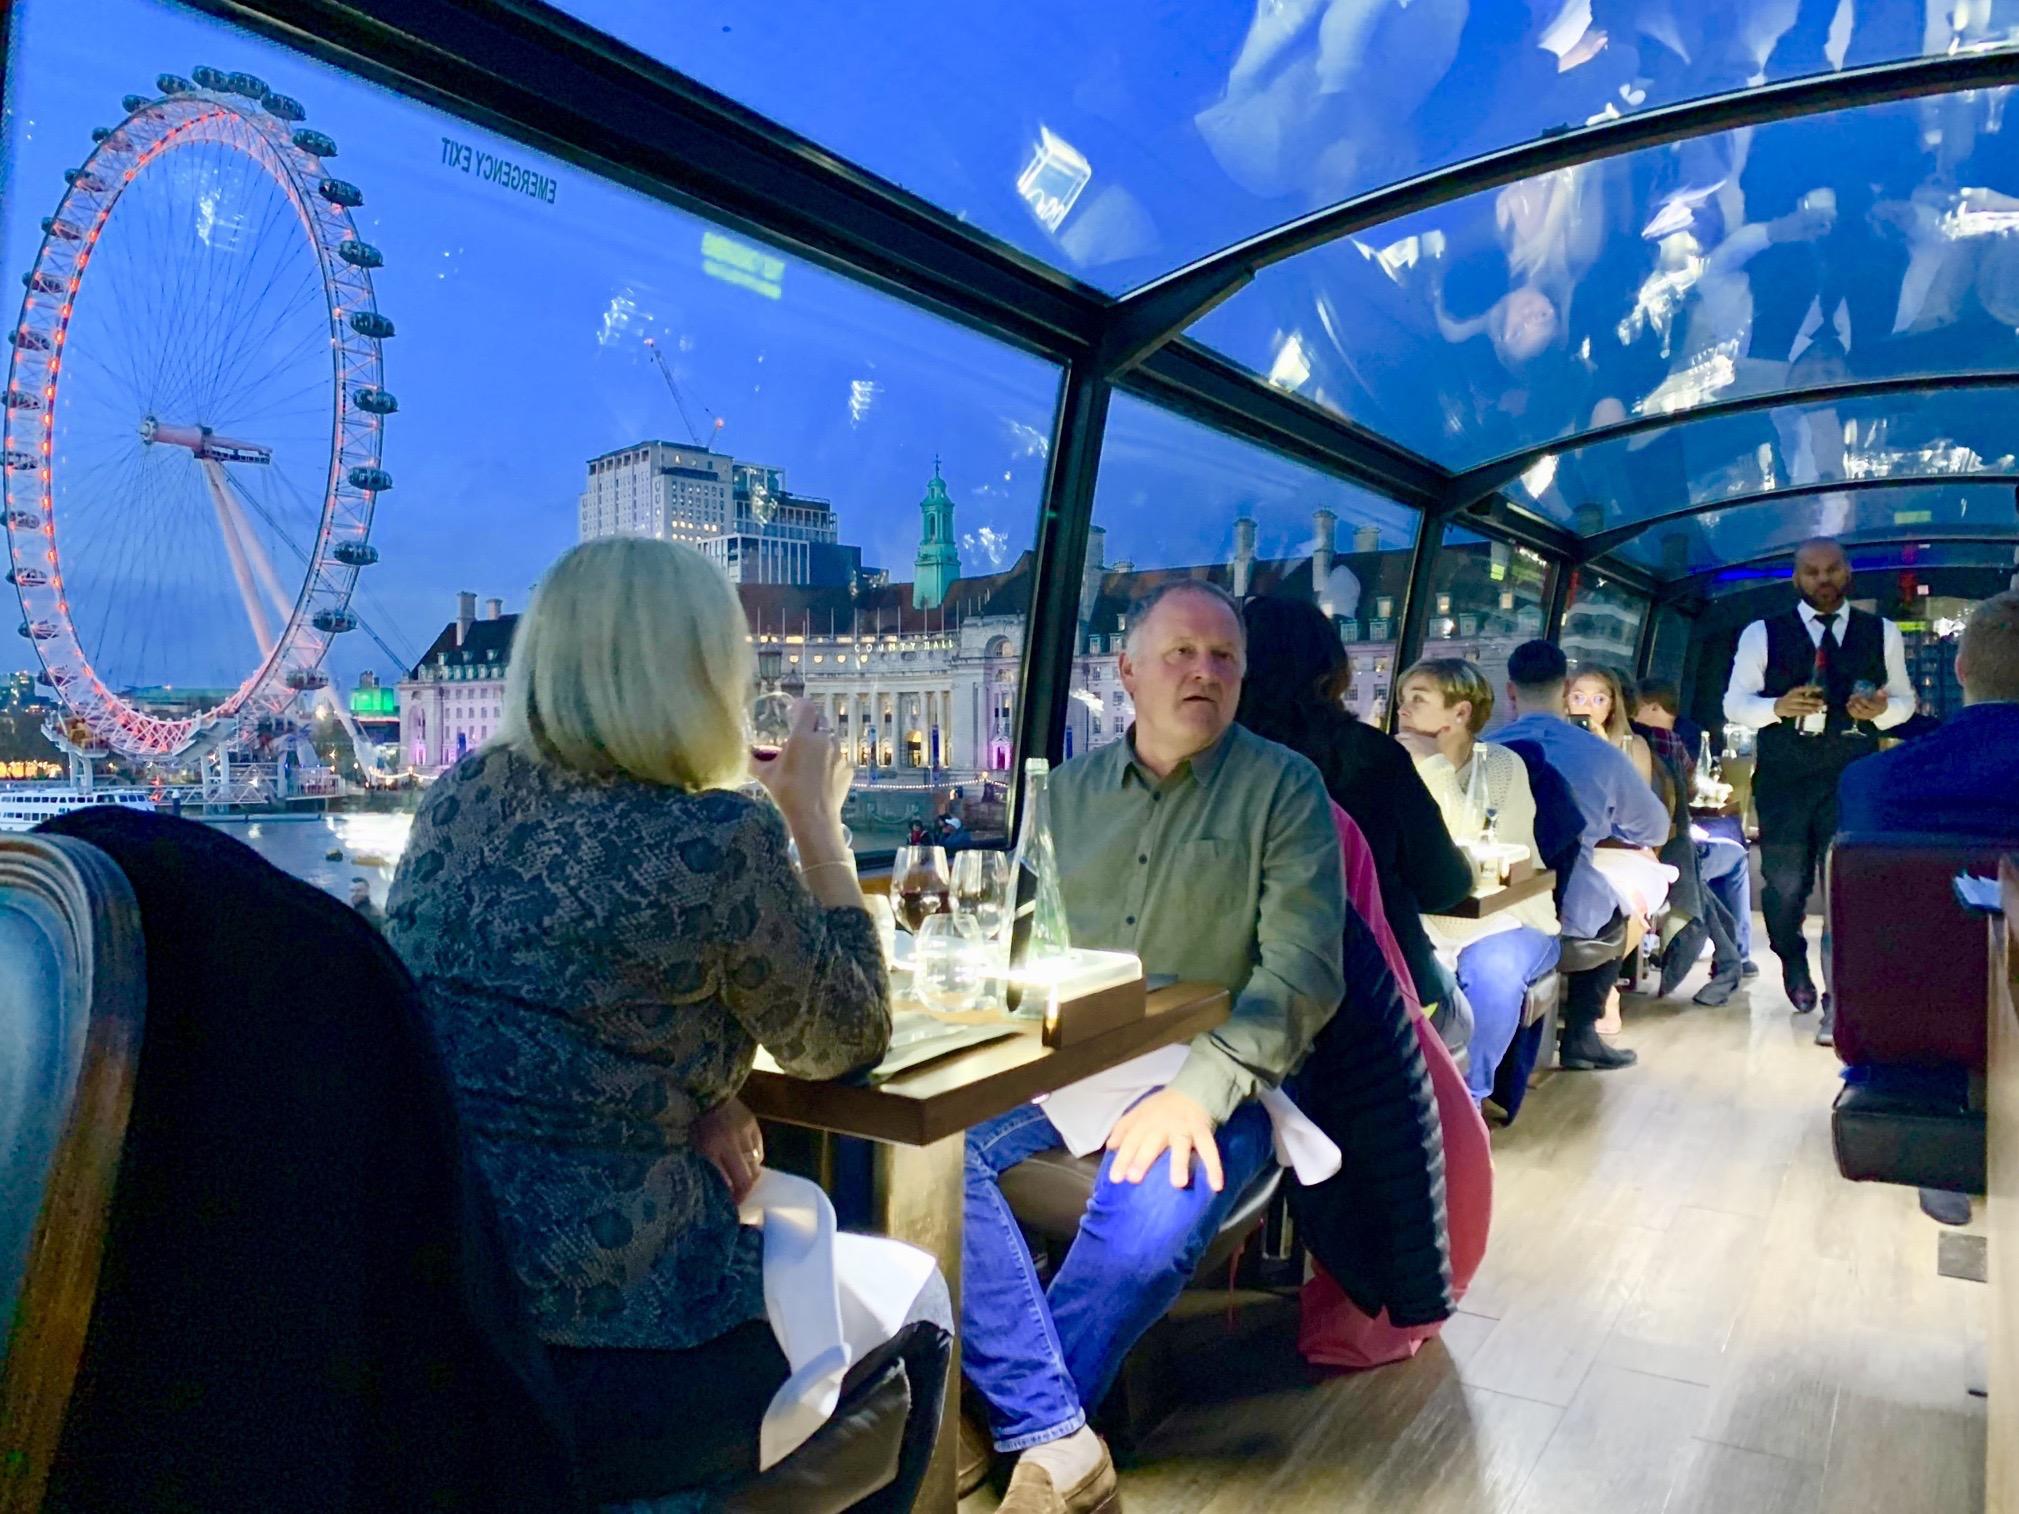 DinnerTour - From £125 + VAT per person